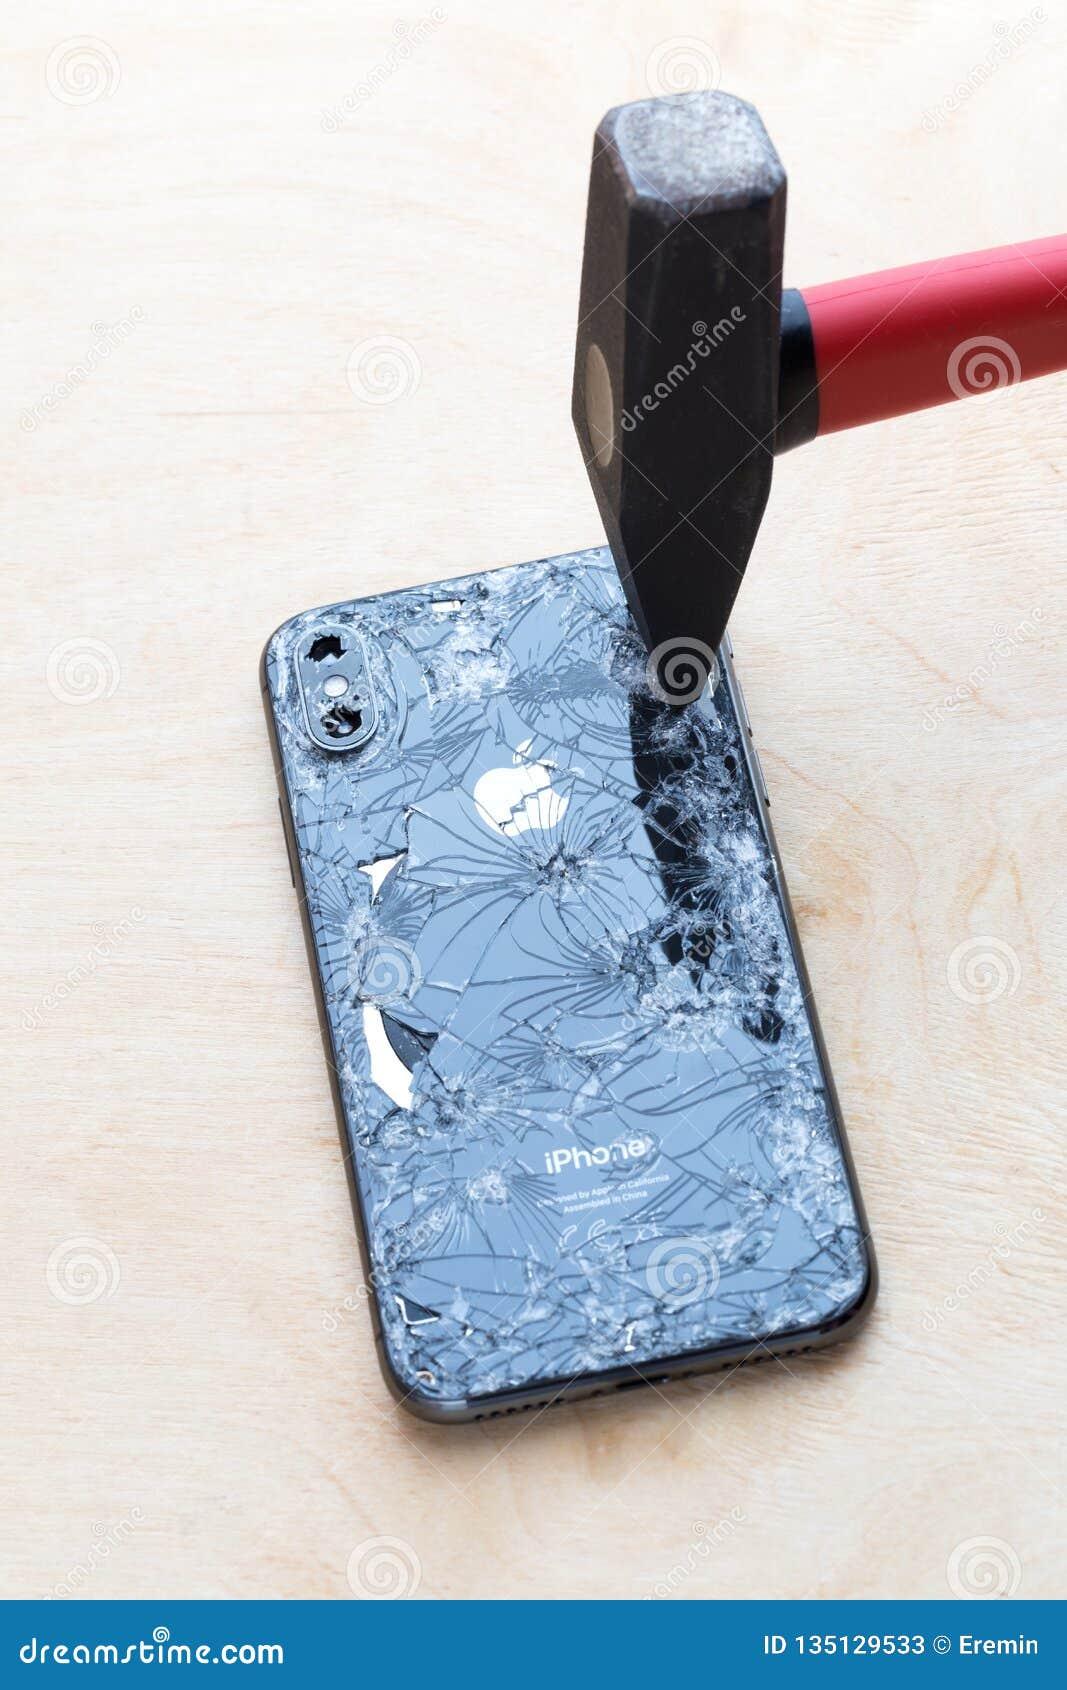 best website 9edef 2969c Broken IPhone XS Lies On A Wooden Surface. Editorial Stock Photo ...